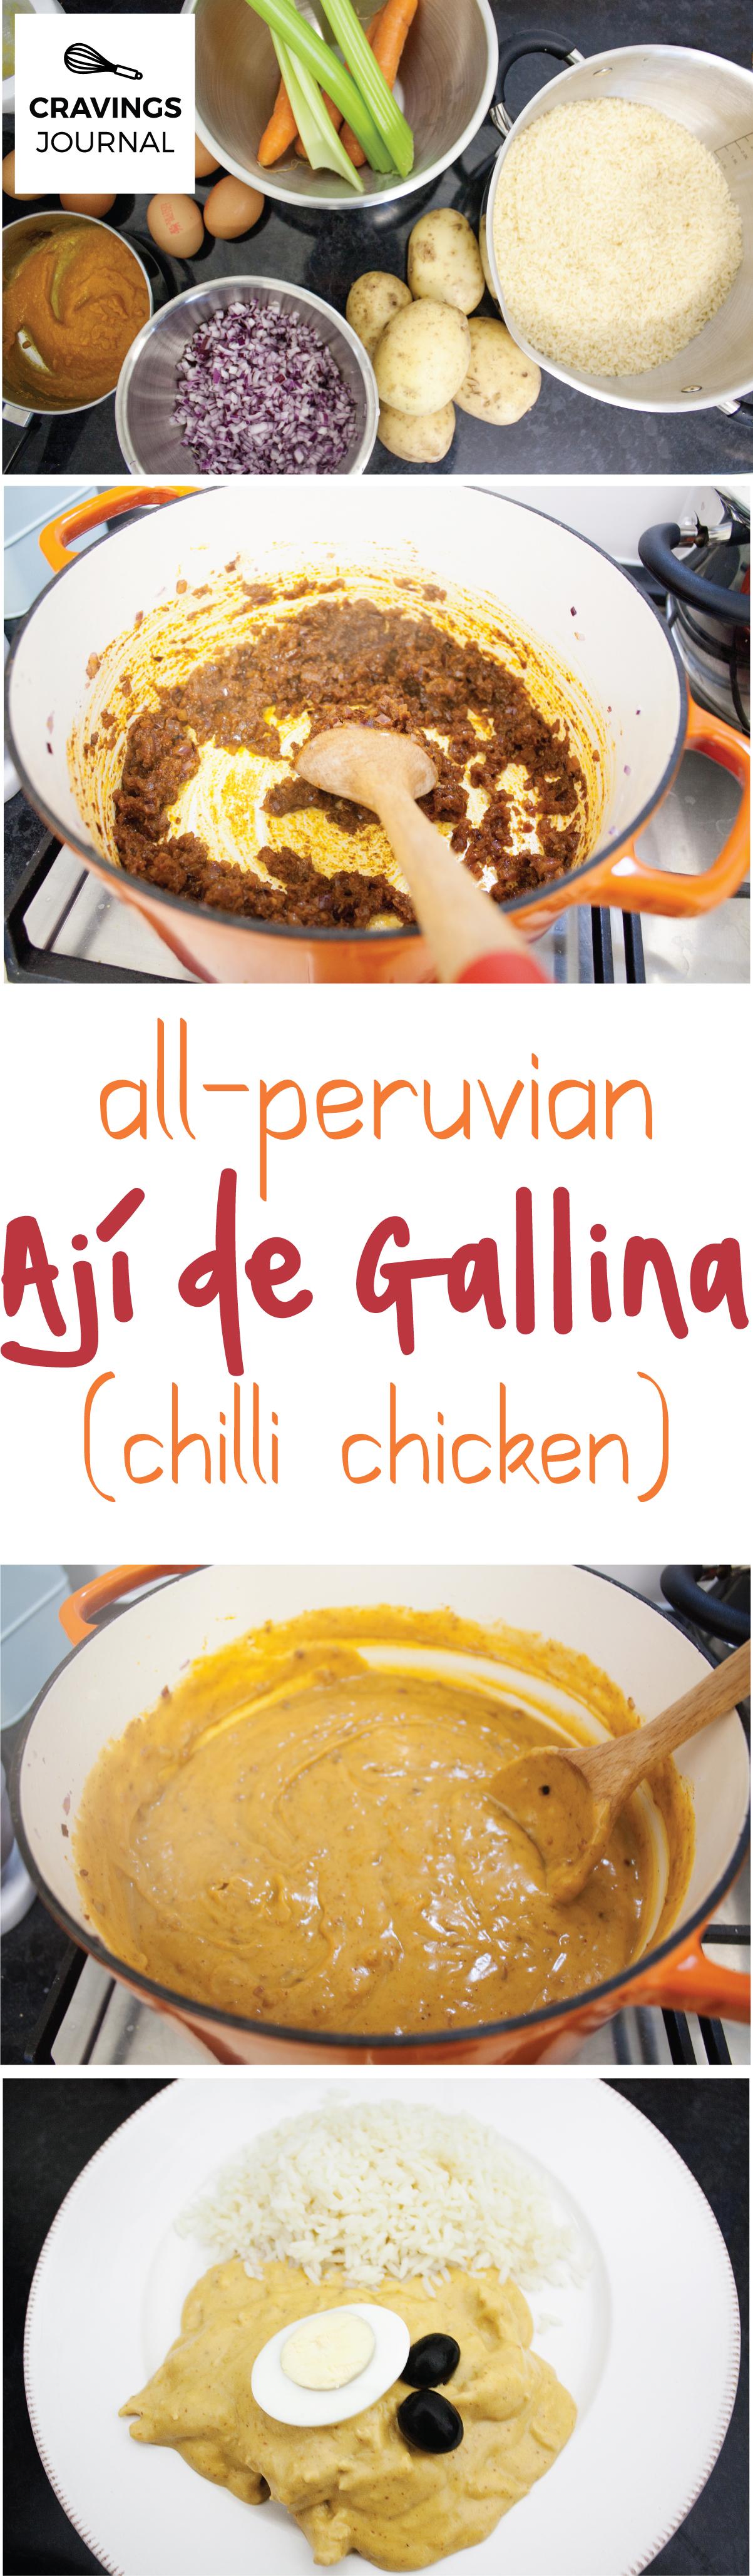 Aji De Gallina Chilli Chicken With Images